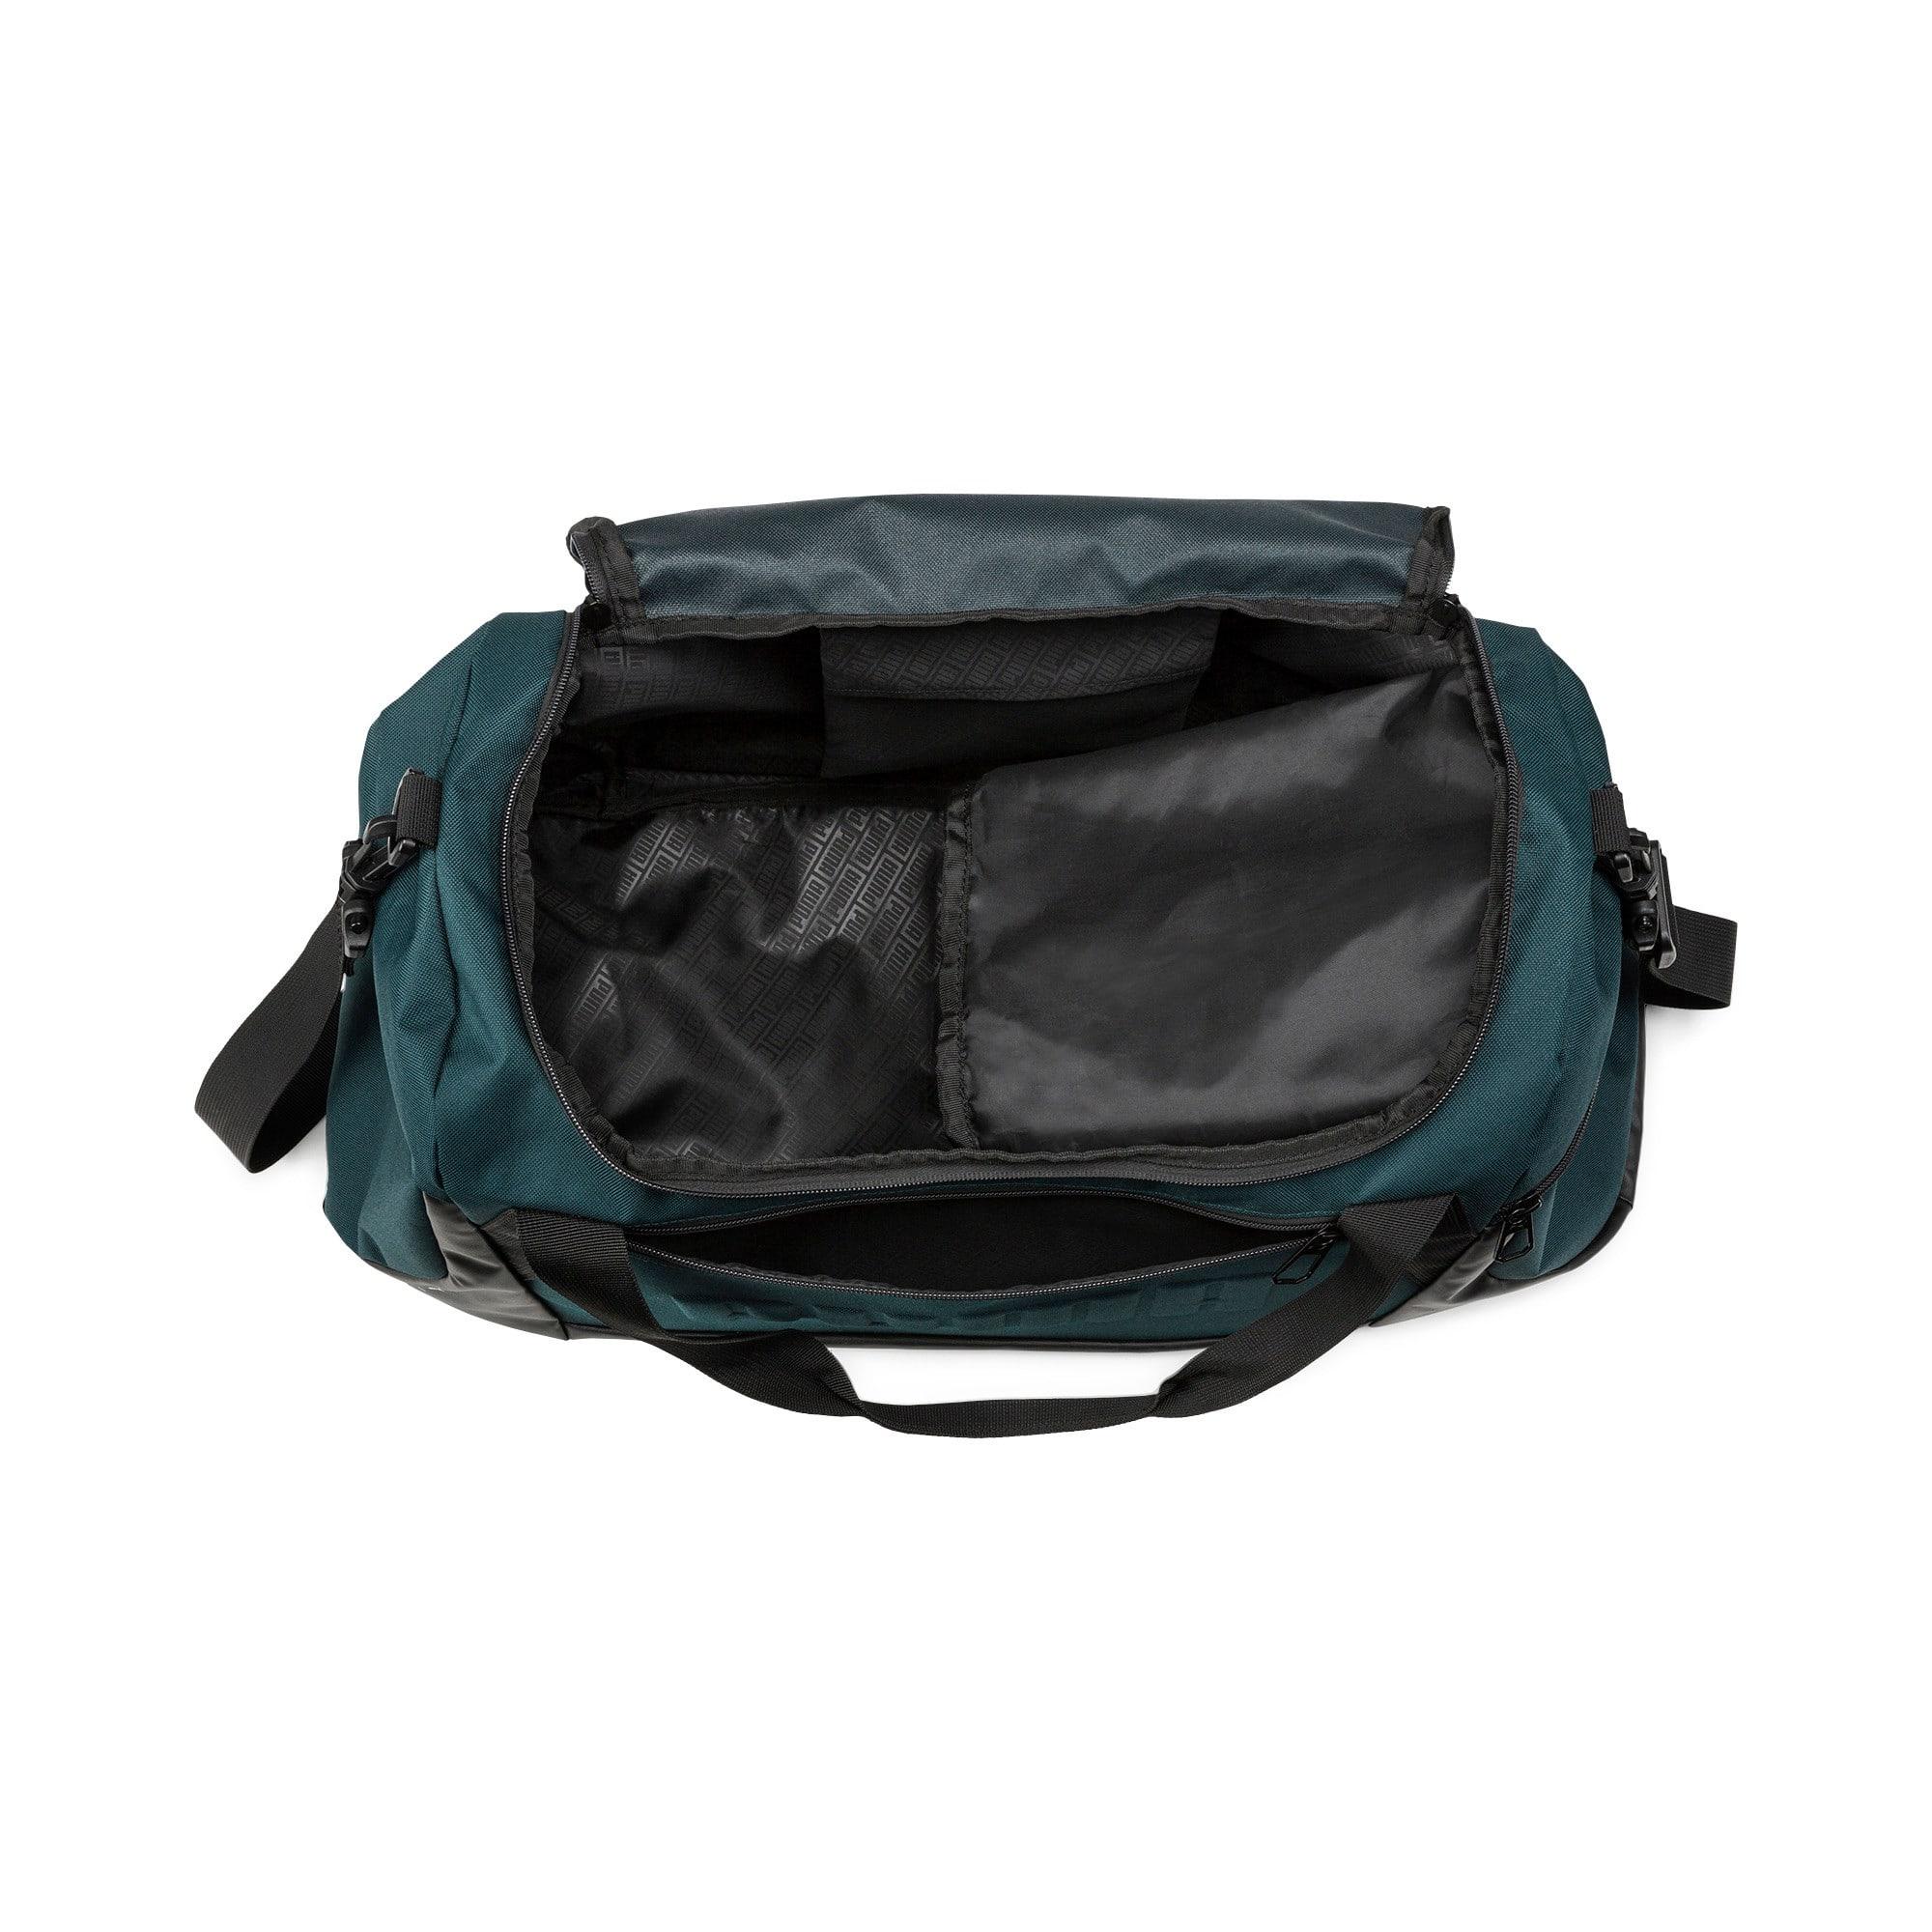 Thumbnail 4 of GYM Medium Duffle Bag, Ponderosa Pine, medium